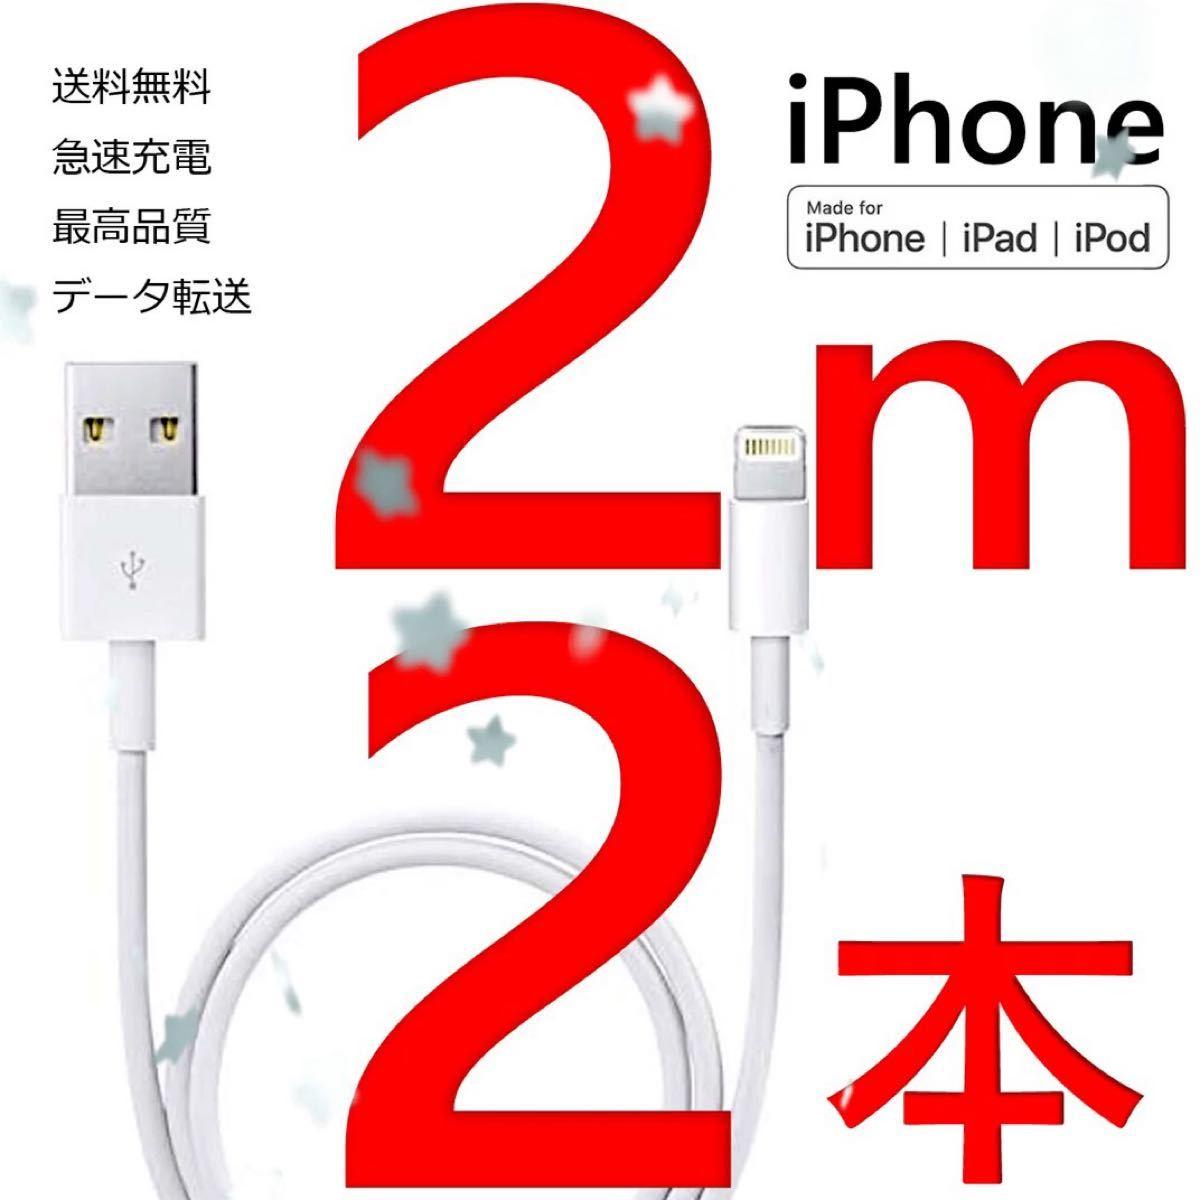 iPhone 充電器 ケーブル lightning cable ライトニングケーブル USB 急速充電 高速充電 データ転送